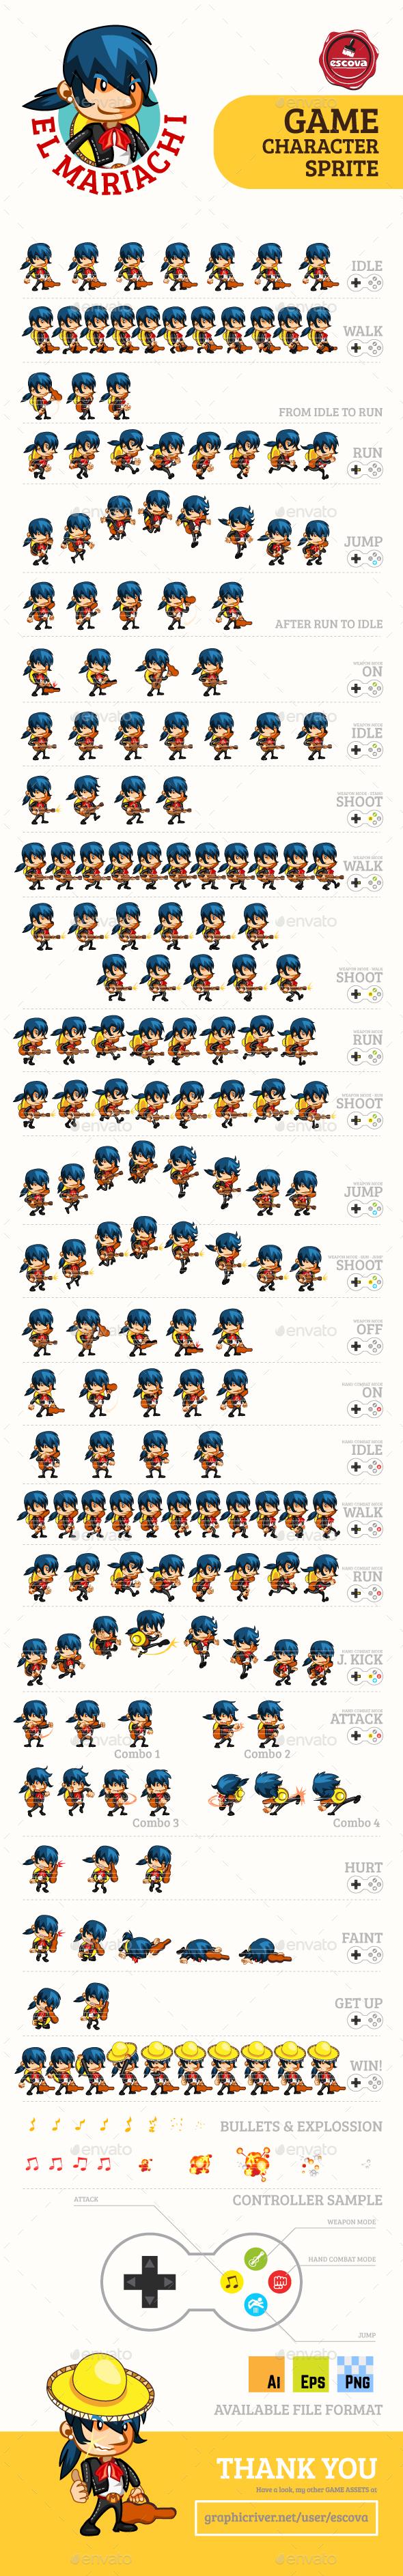 El Mariachi Game Character Sprites (Sprites)